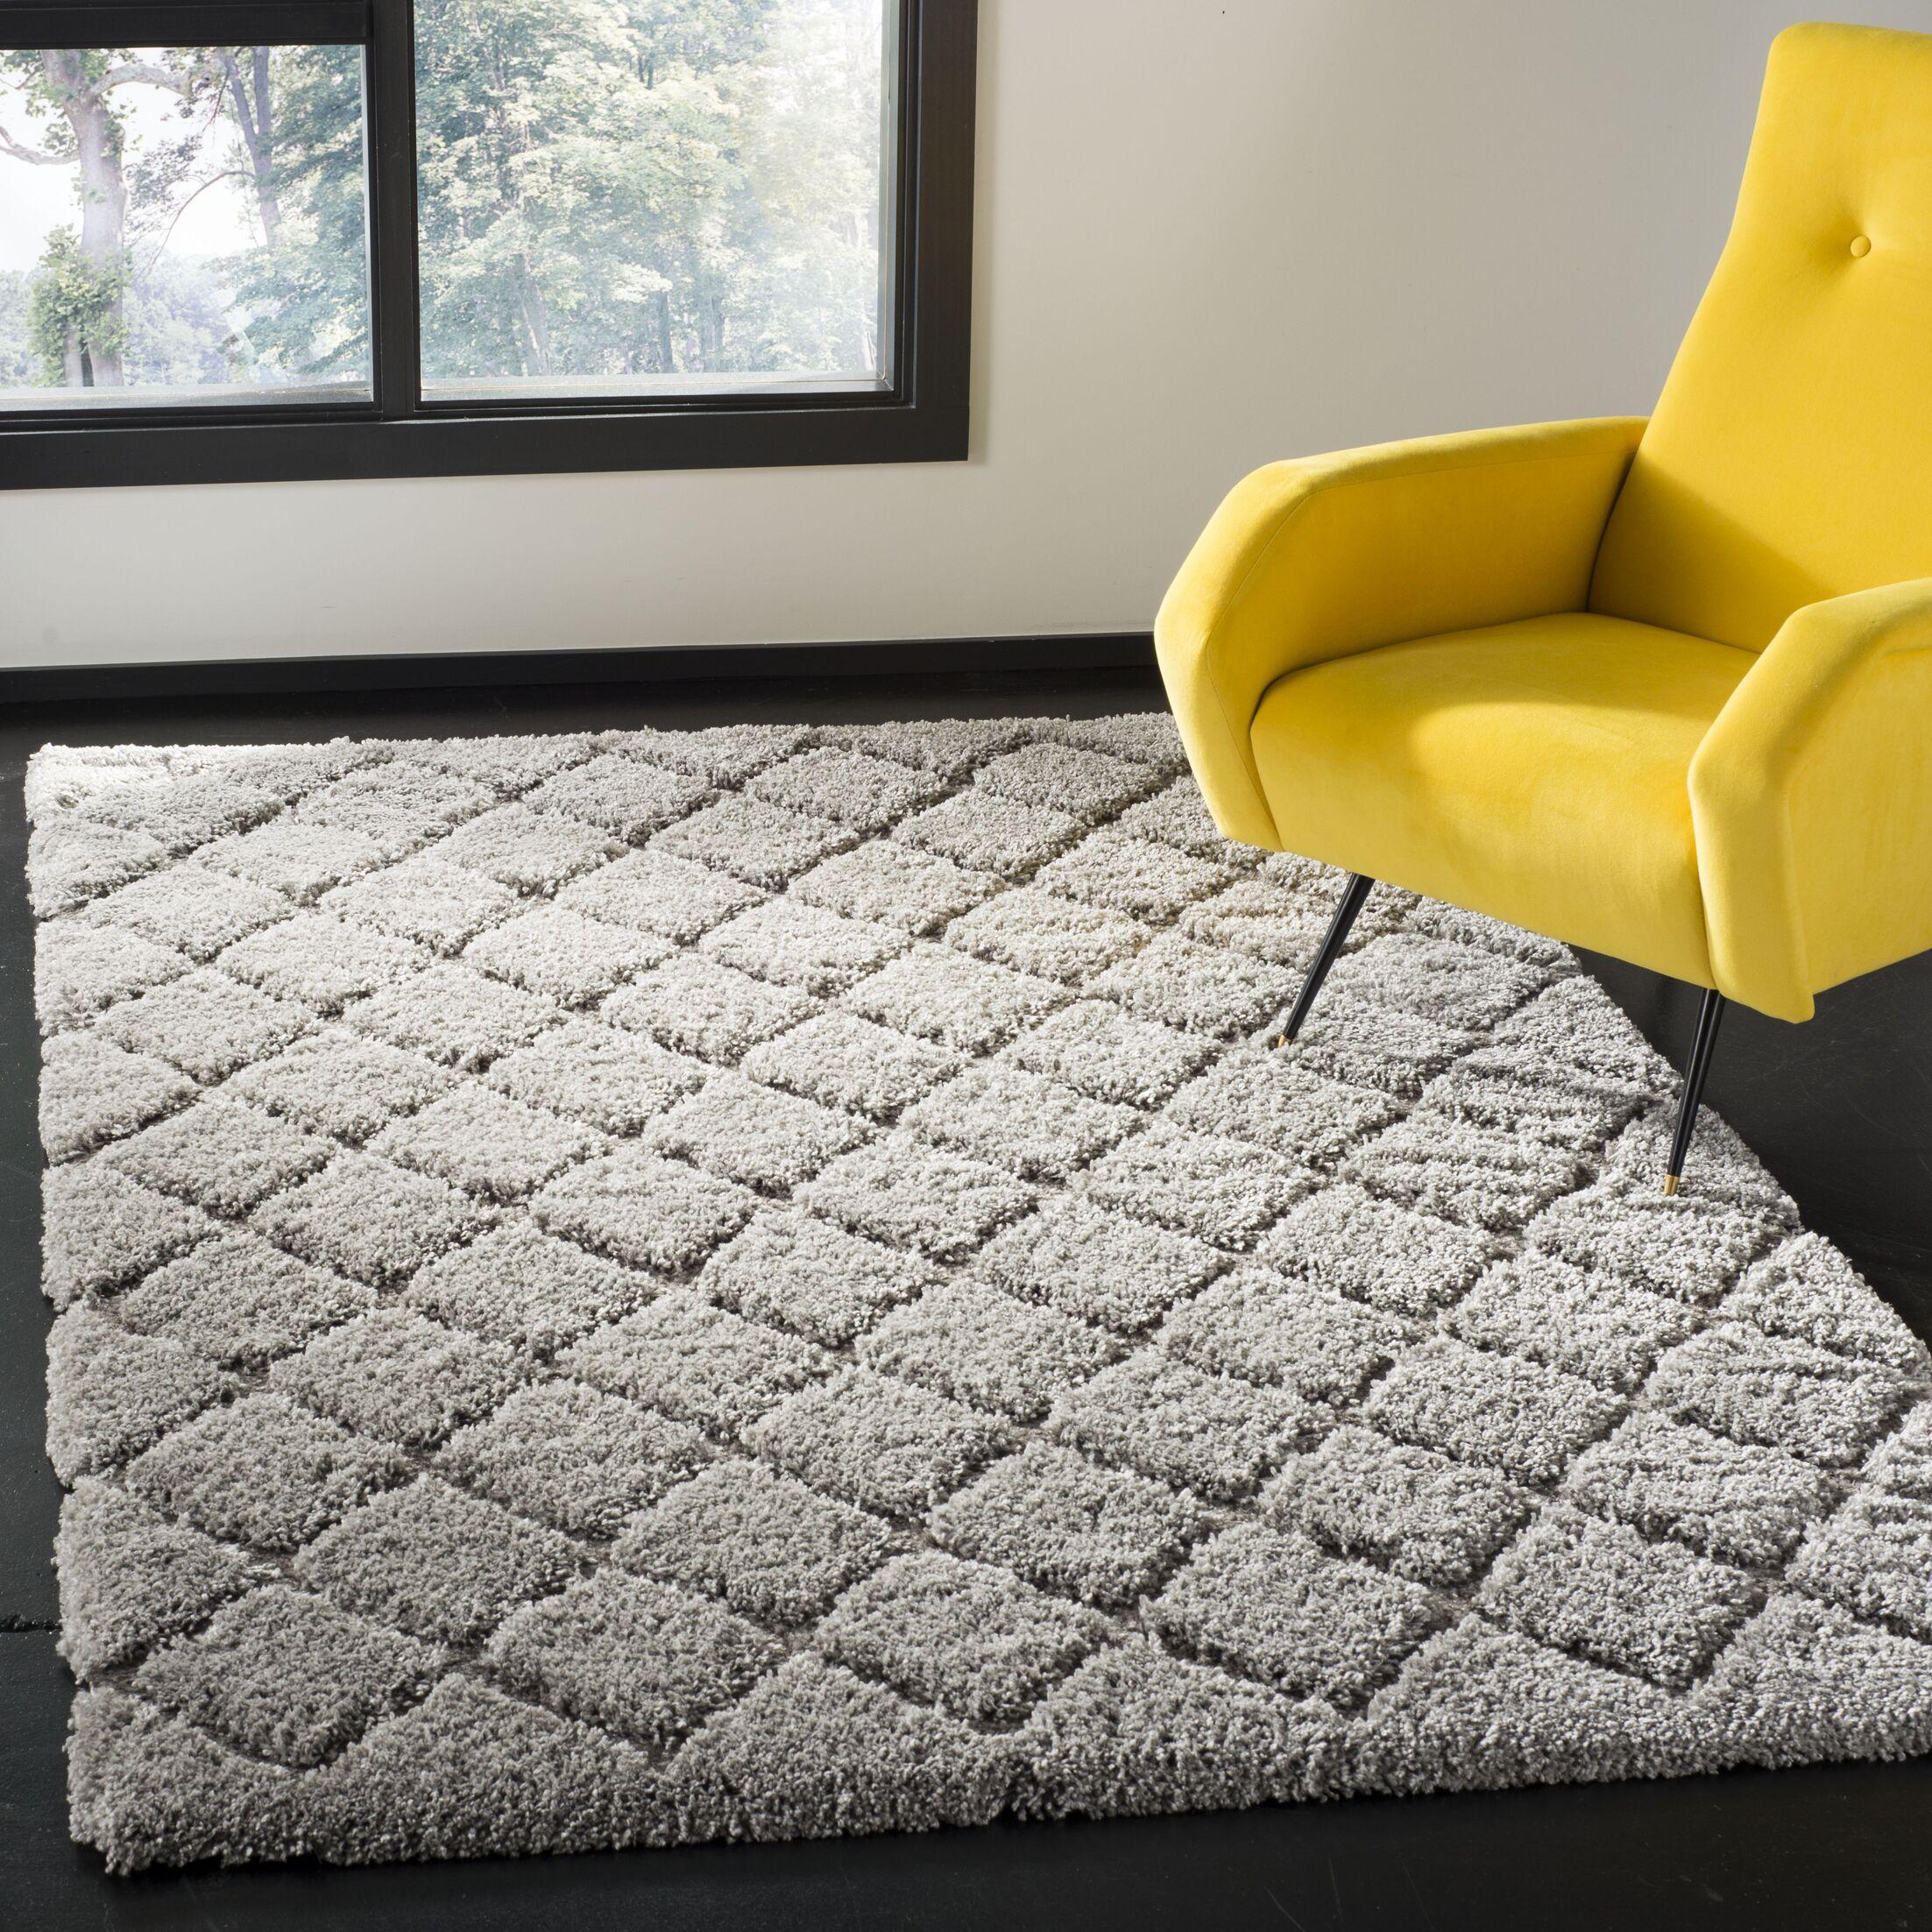 Felten Light Gray Area Rug Rug Size: Rectangle 8' x 10'